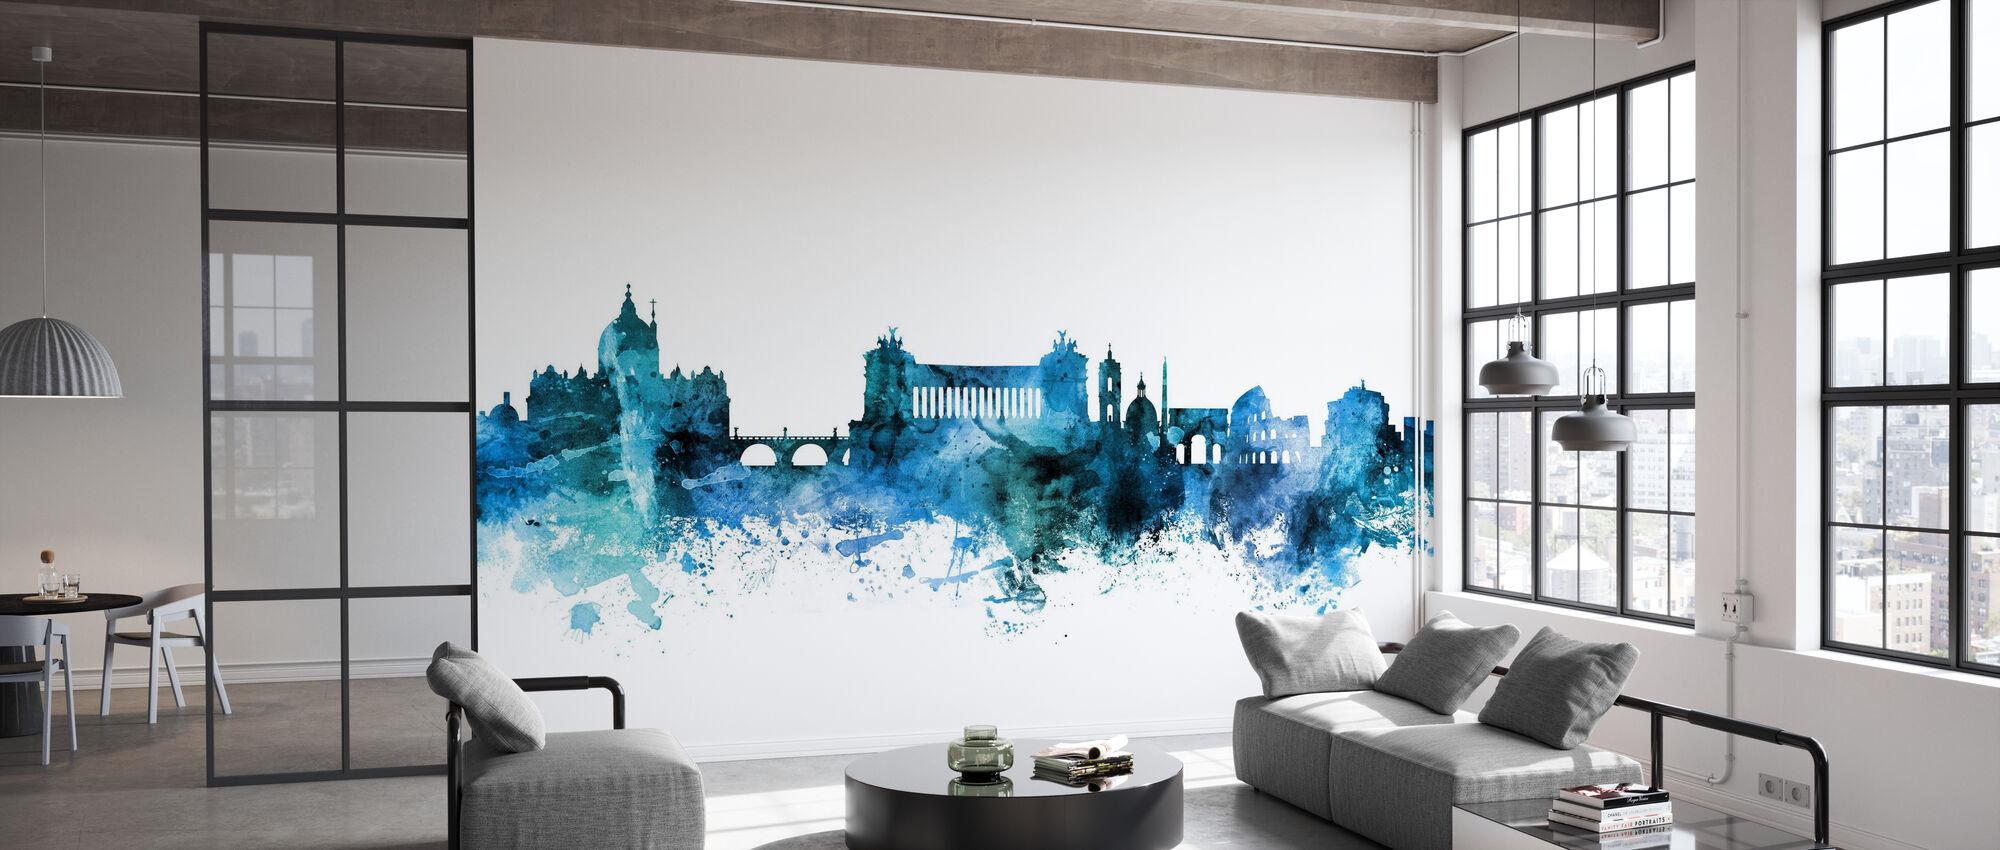 Rome Italy Skyline - Wallpaper - Office